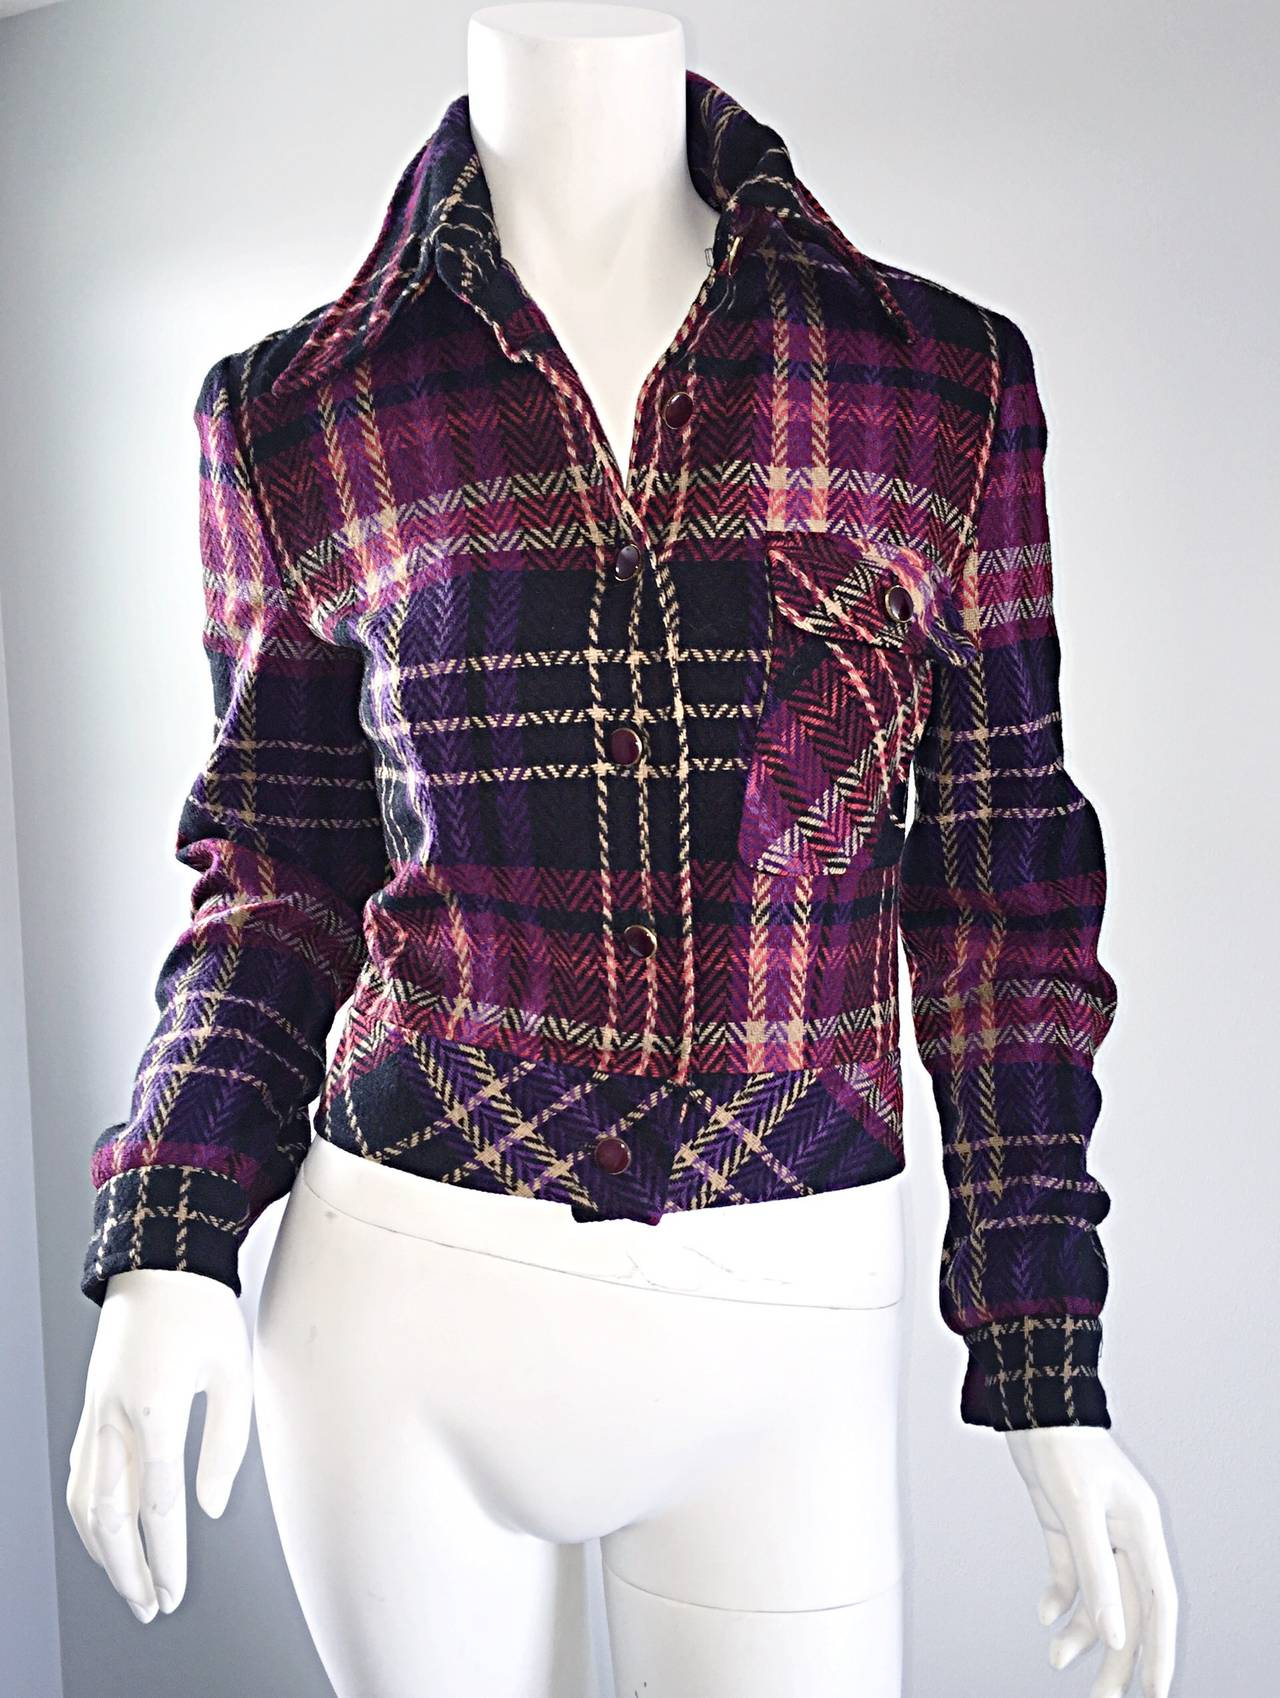 1970s Vintage Addena for I. Magnin Pink + Purple Plaid Herringbone Wool Jacket 9